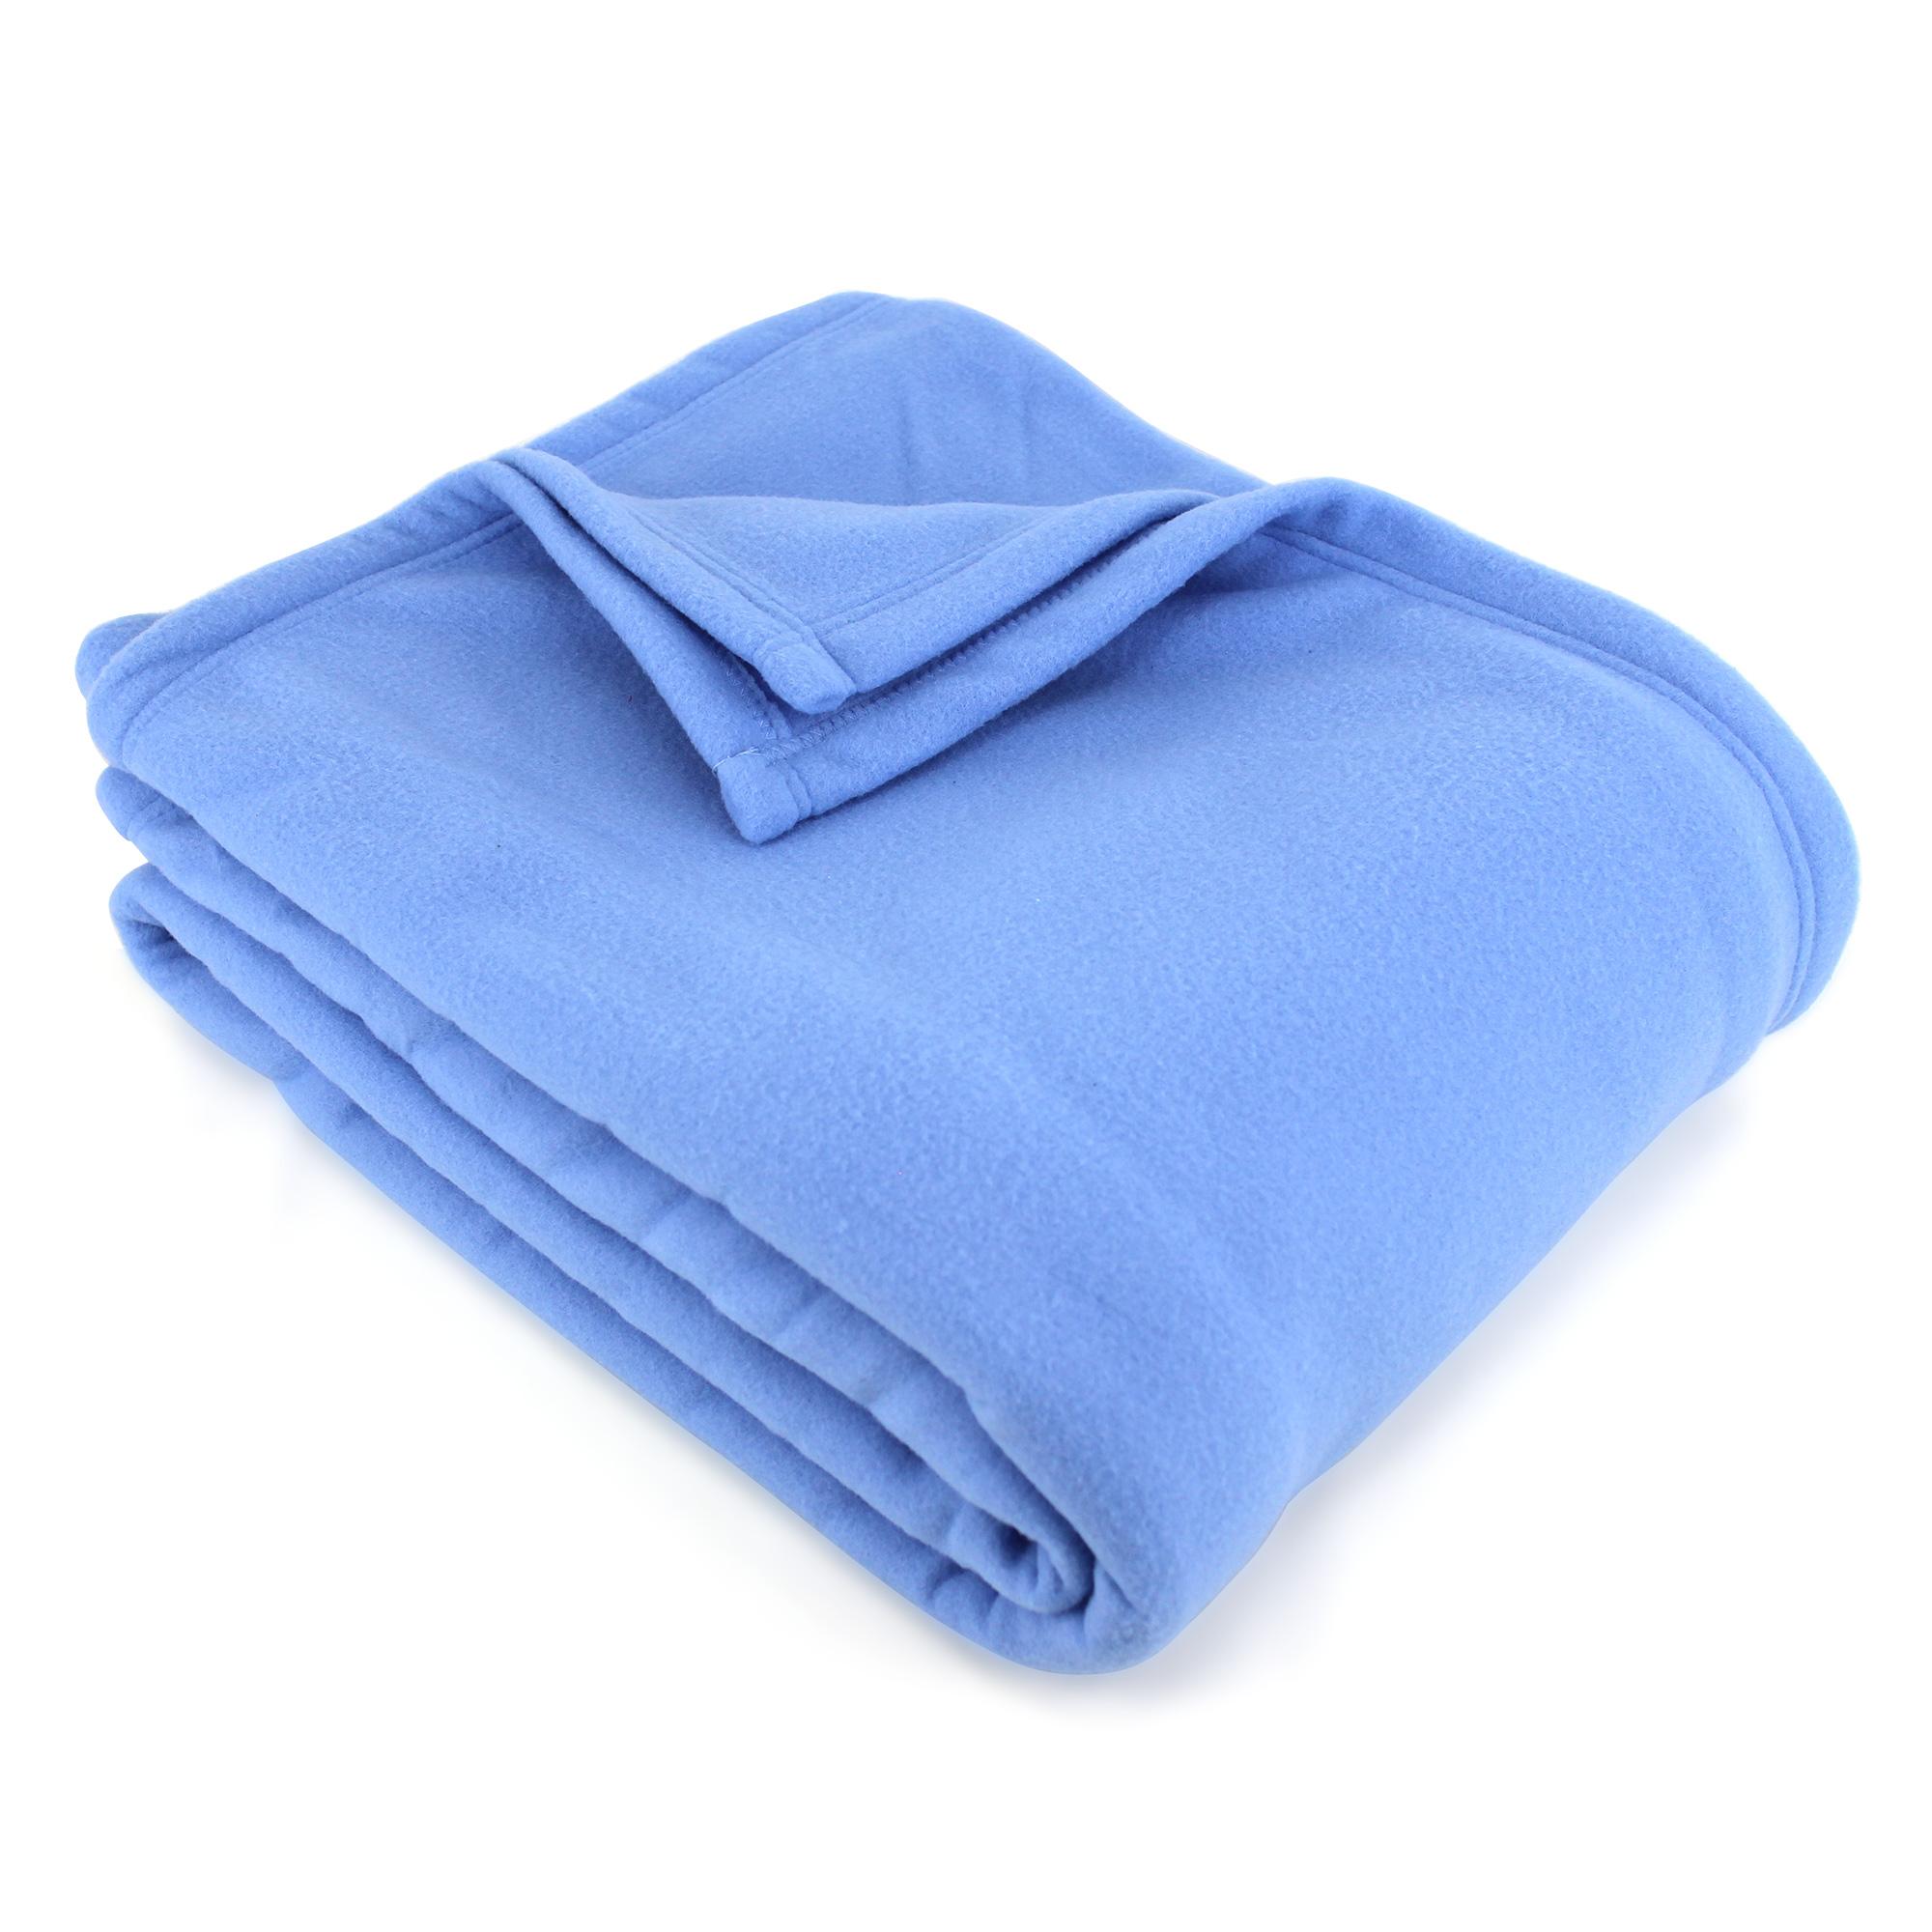 Couverture-polaire-220x240-100-Polyester-350g-m2-TEDDY-Bleu-Azur